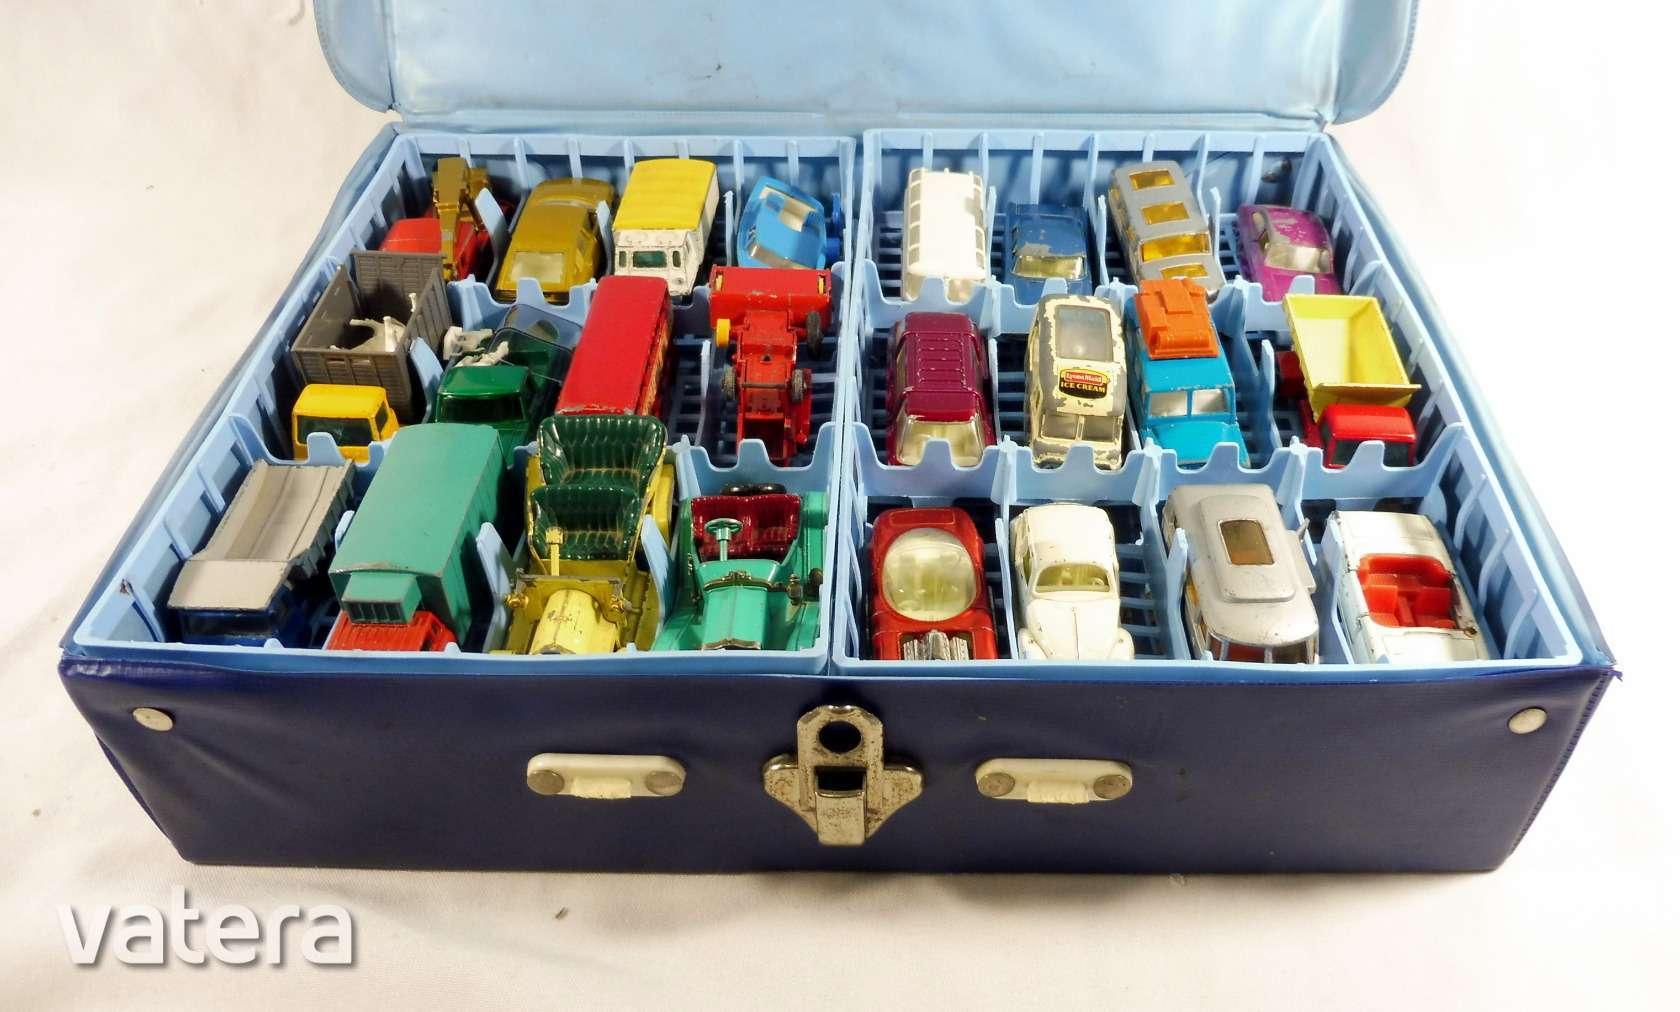 regi-matchbox-kisauto-gyujto-doboz-taska-benne-25-db-jatek-auto-d71b_4_big.jpg